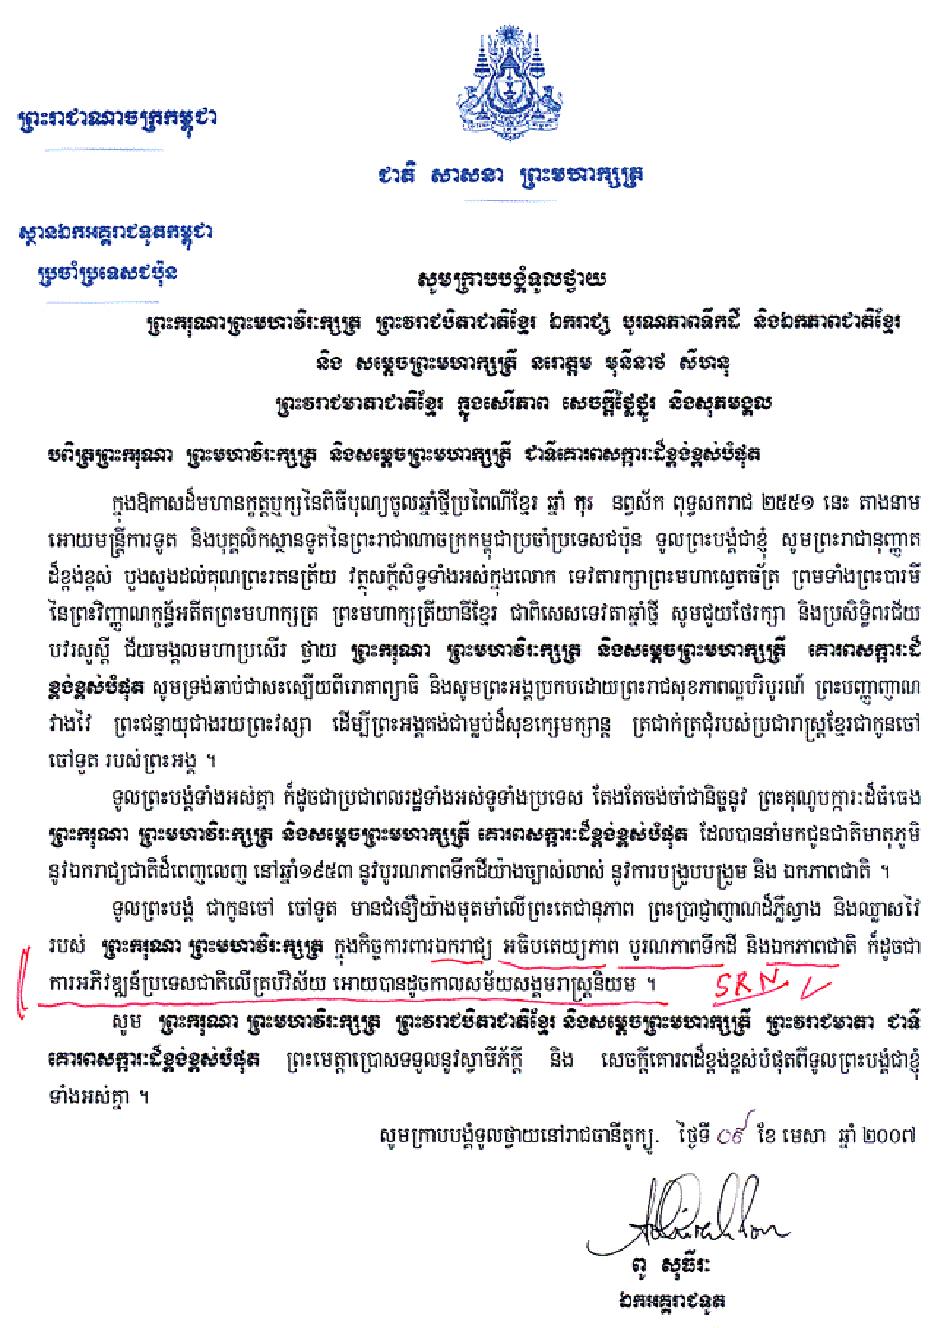 All/correspondance/CorrespondancedEtat/2013/Aout/id1362/photo001.jpg